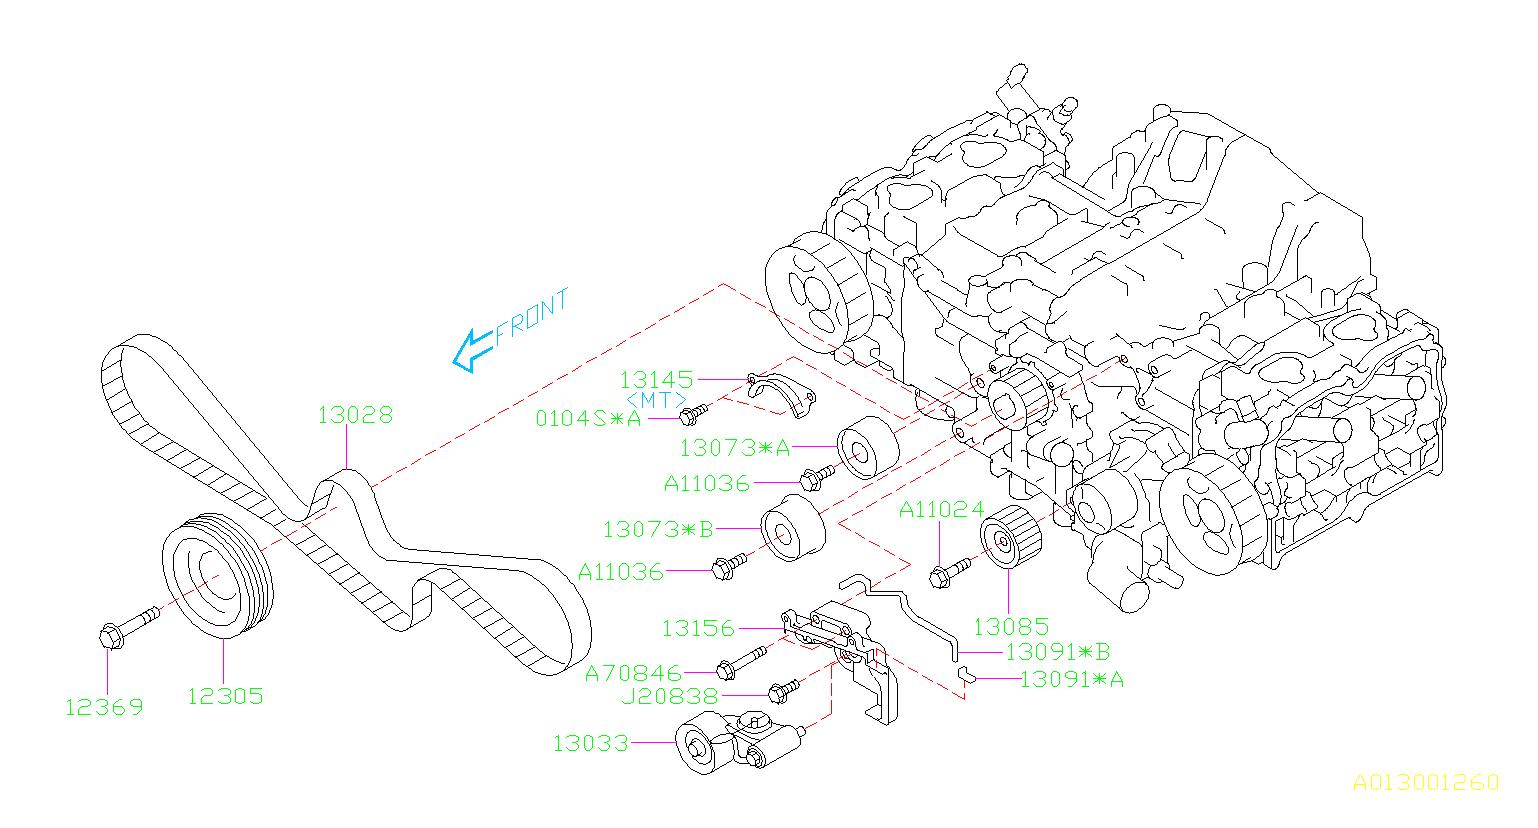 2011 Subaru Outback Engine Timing Belt  Maintenance  Kit  Camshaft - 13028aa231